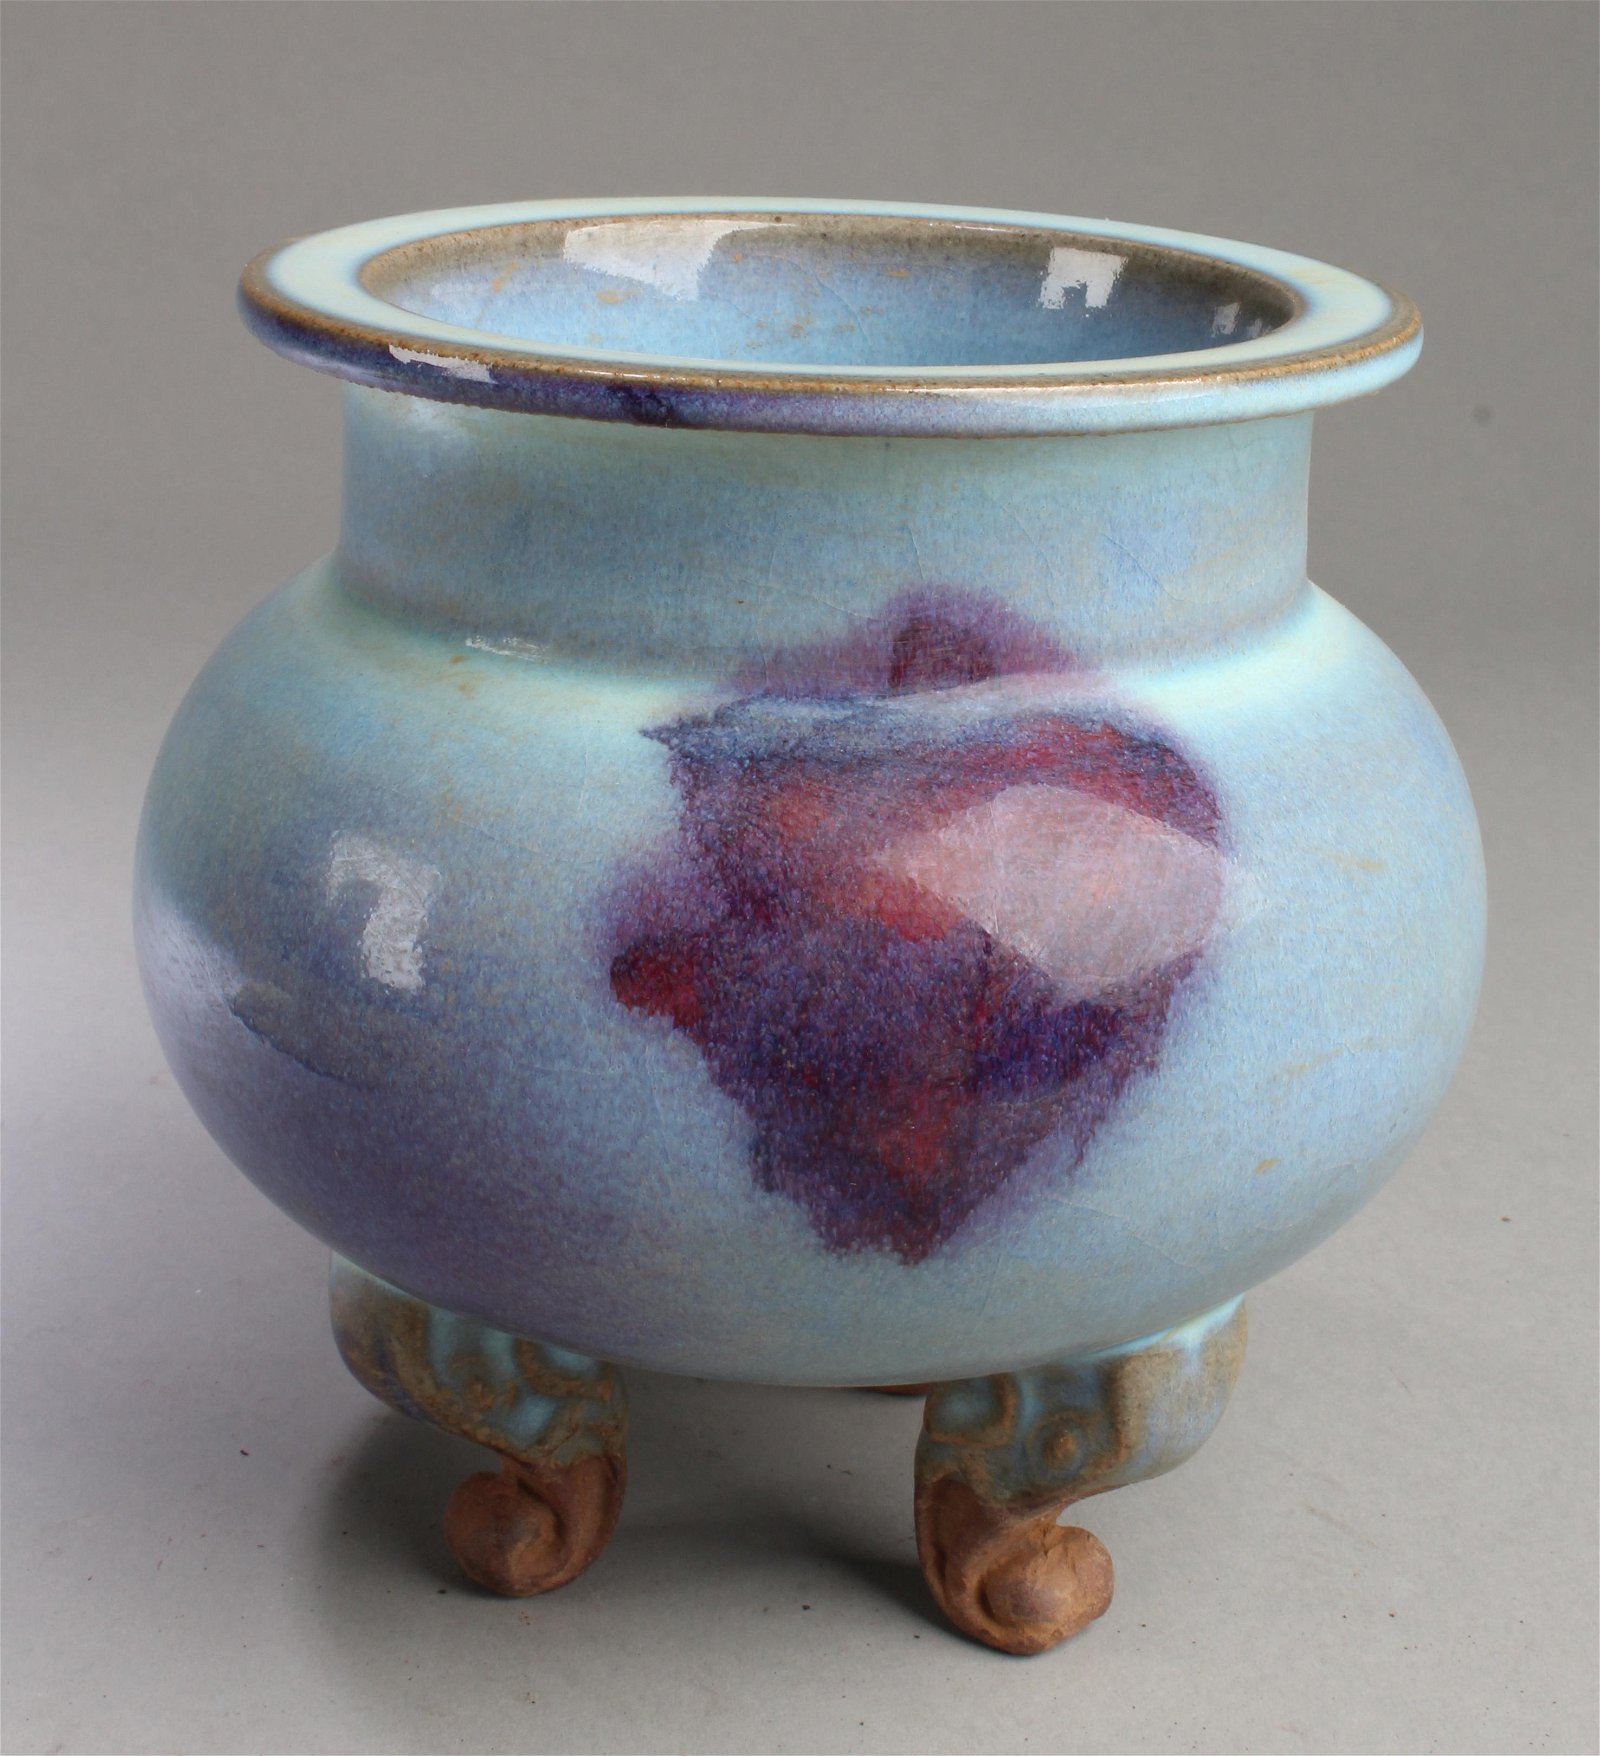 Chinese Junyao Tripod Porcelain Censer